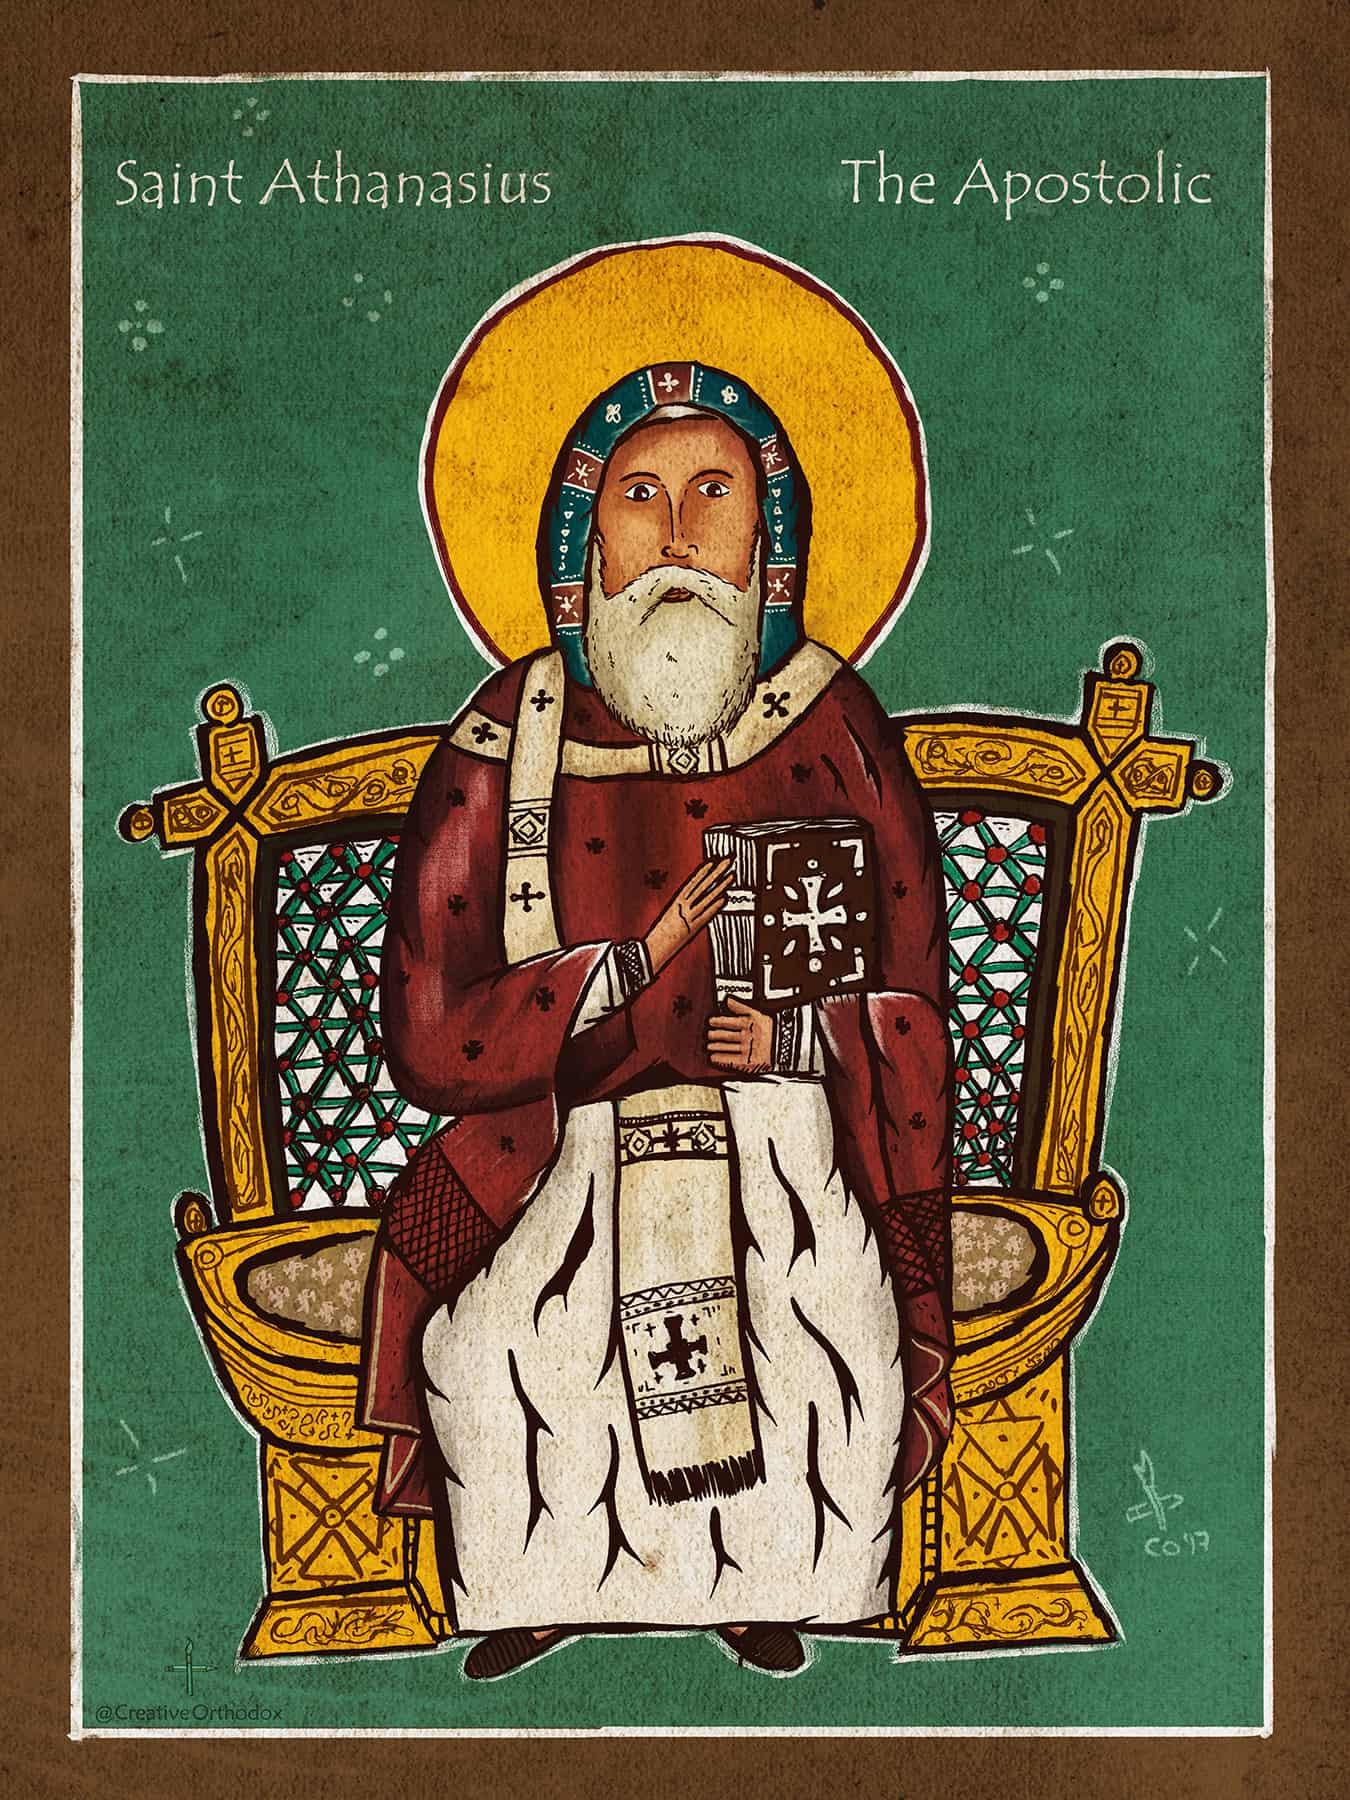 Saint Athanasius The Apostolic